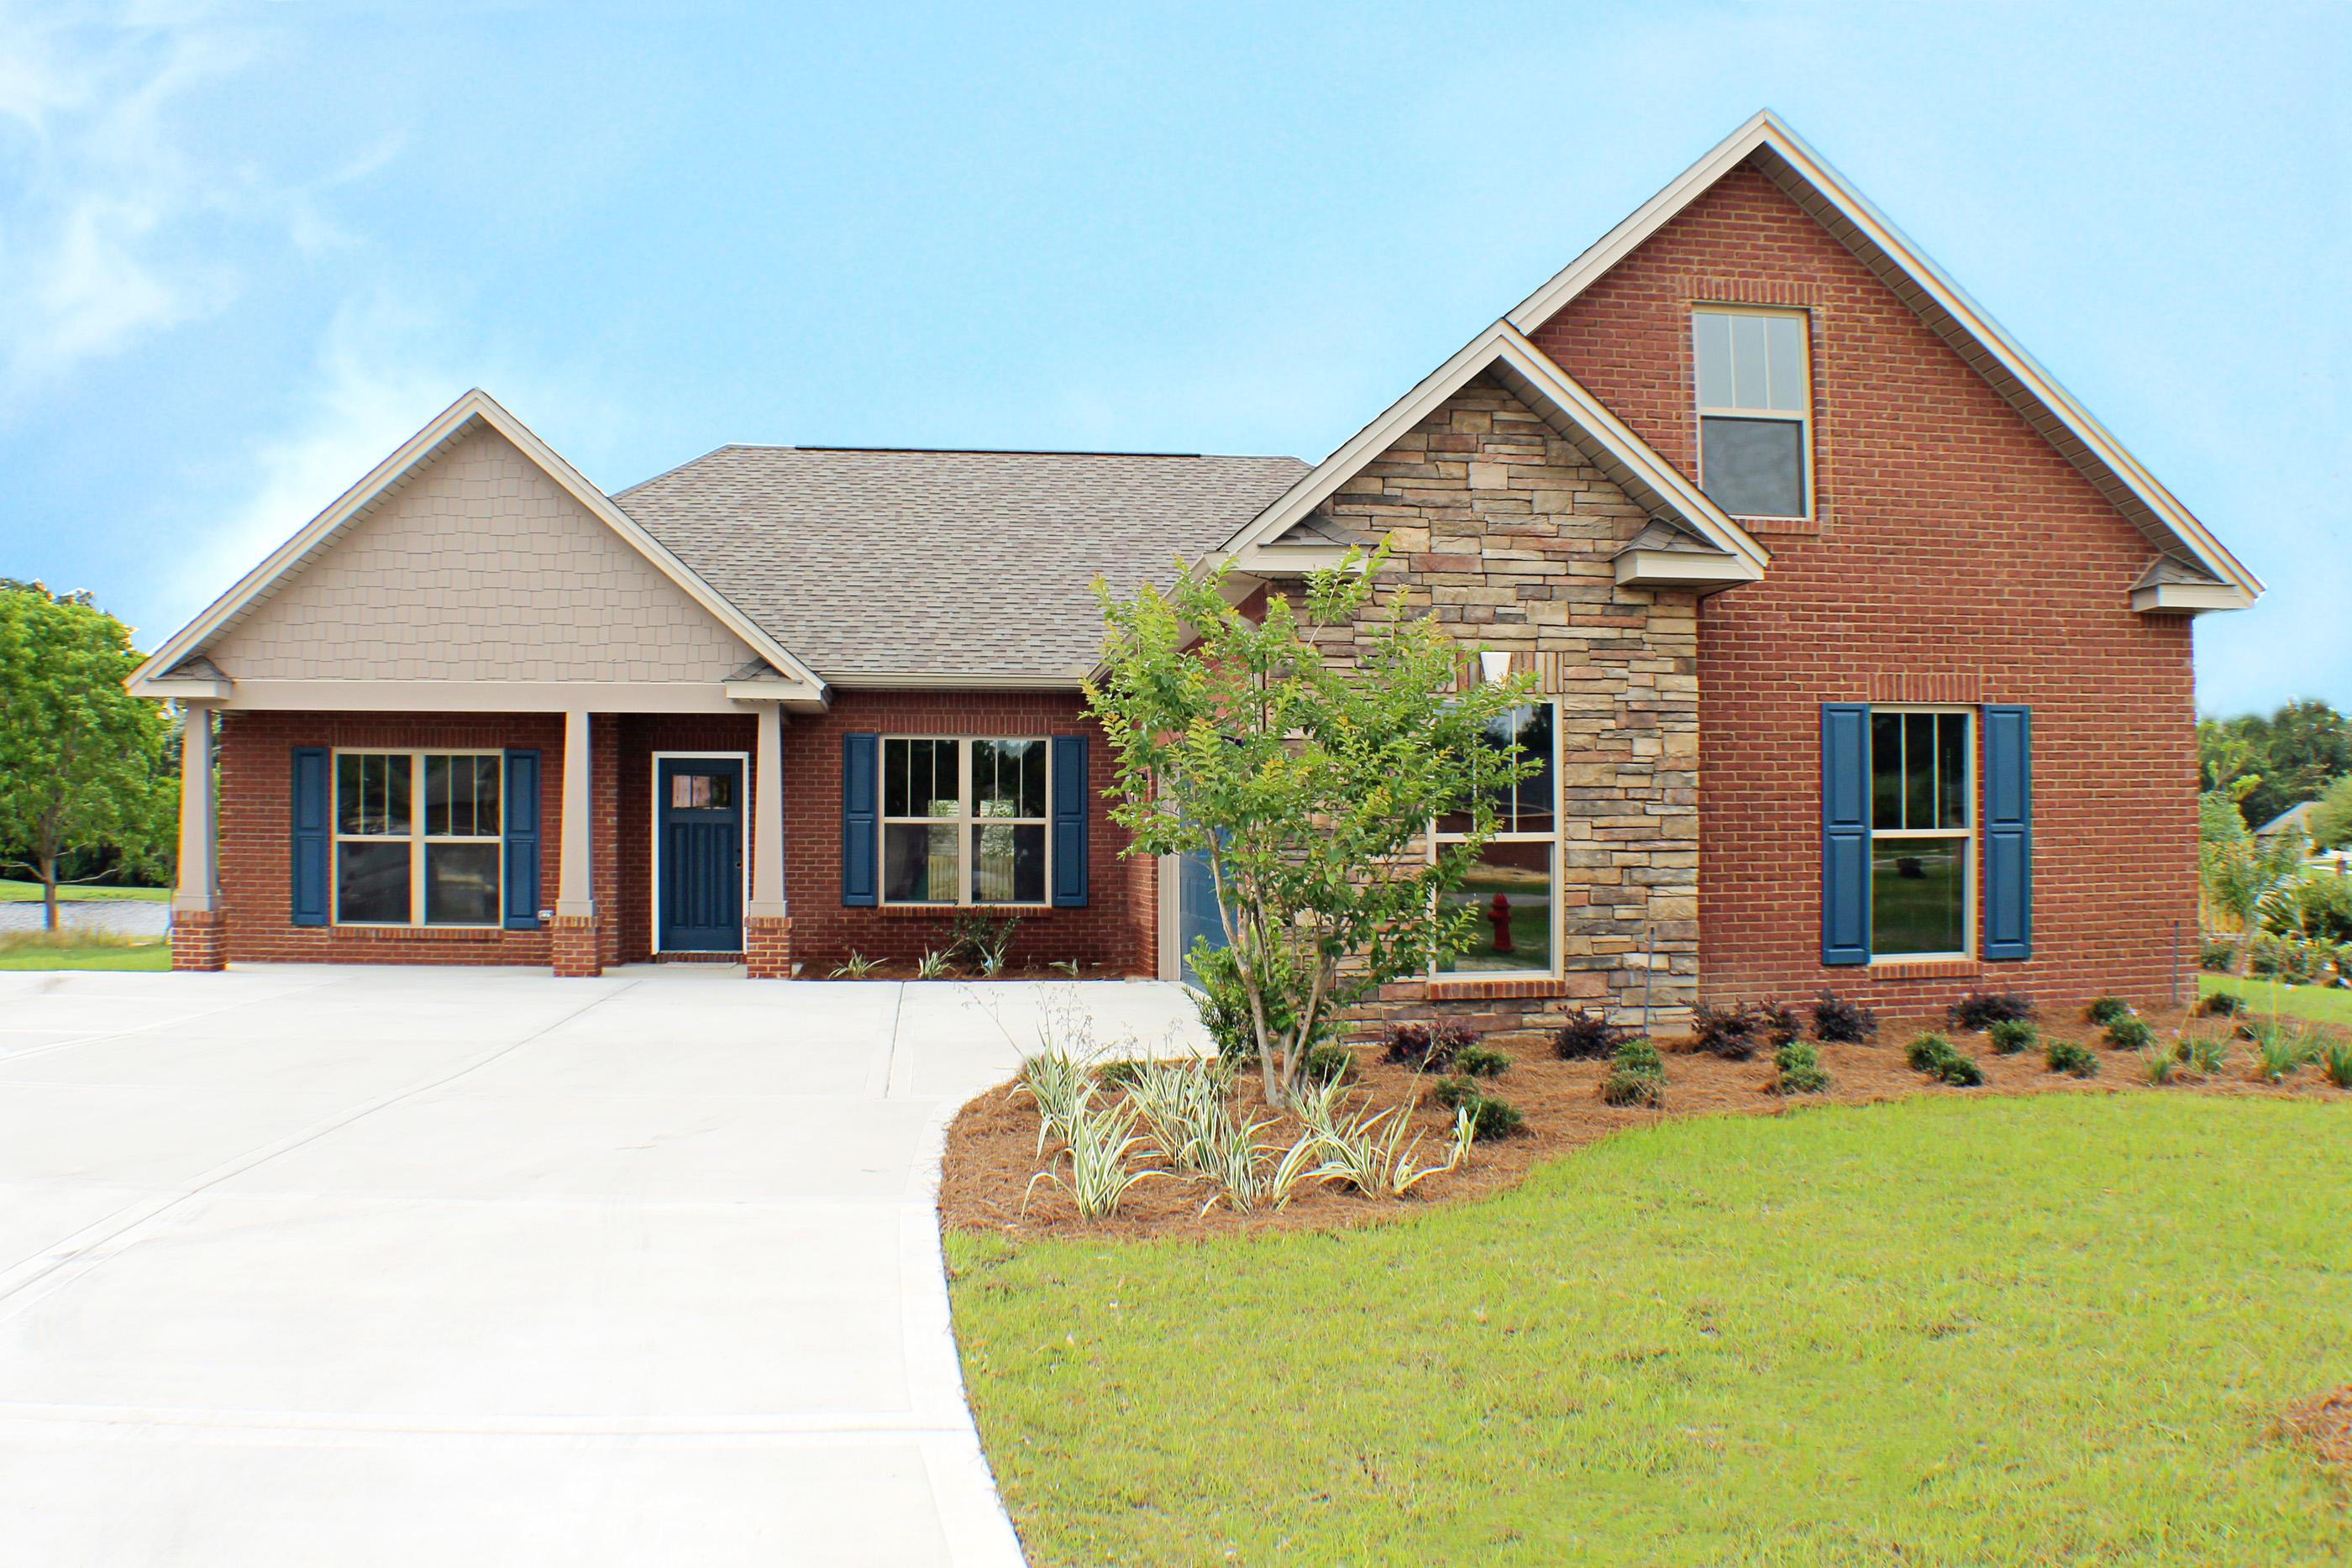 Southern coastal homes exterior 2 for Southern coastal homes